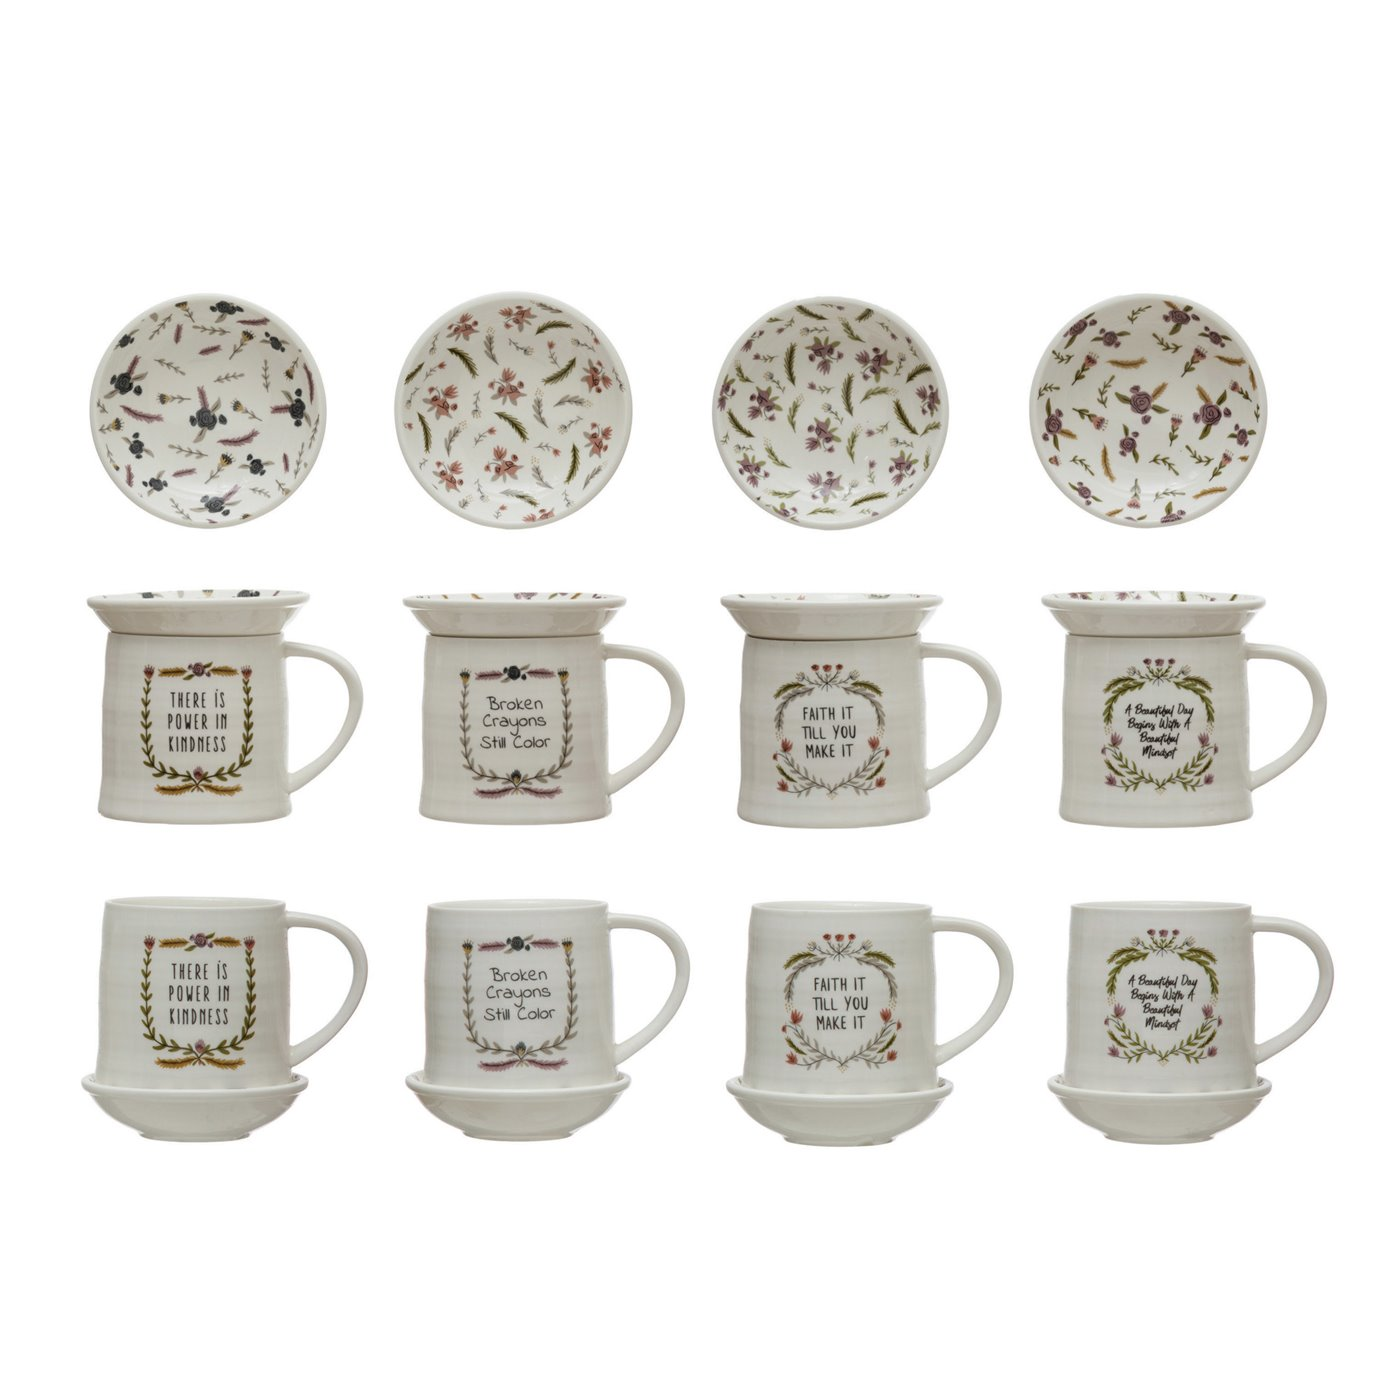 "Stoneware Mug w/ 4"" Round Snack Plate Topper & Saying, 4 Styles, Set of 2"